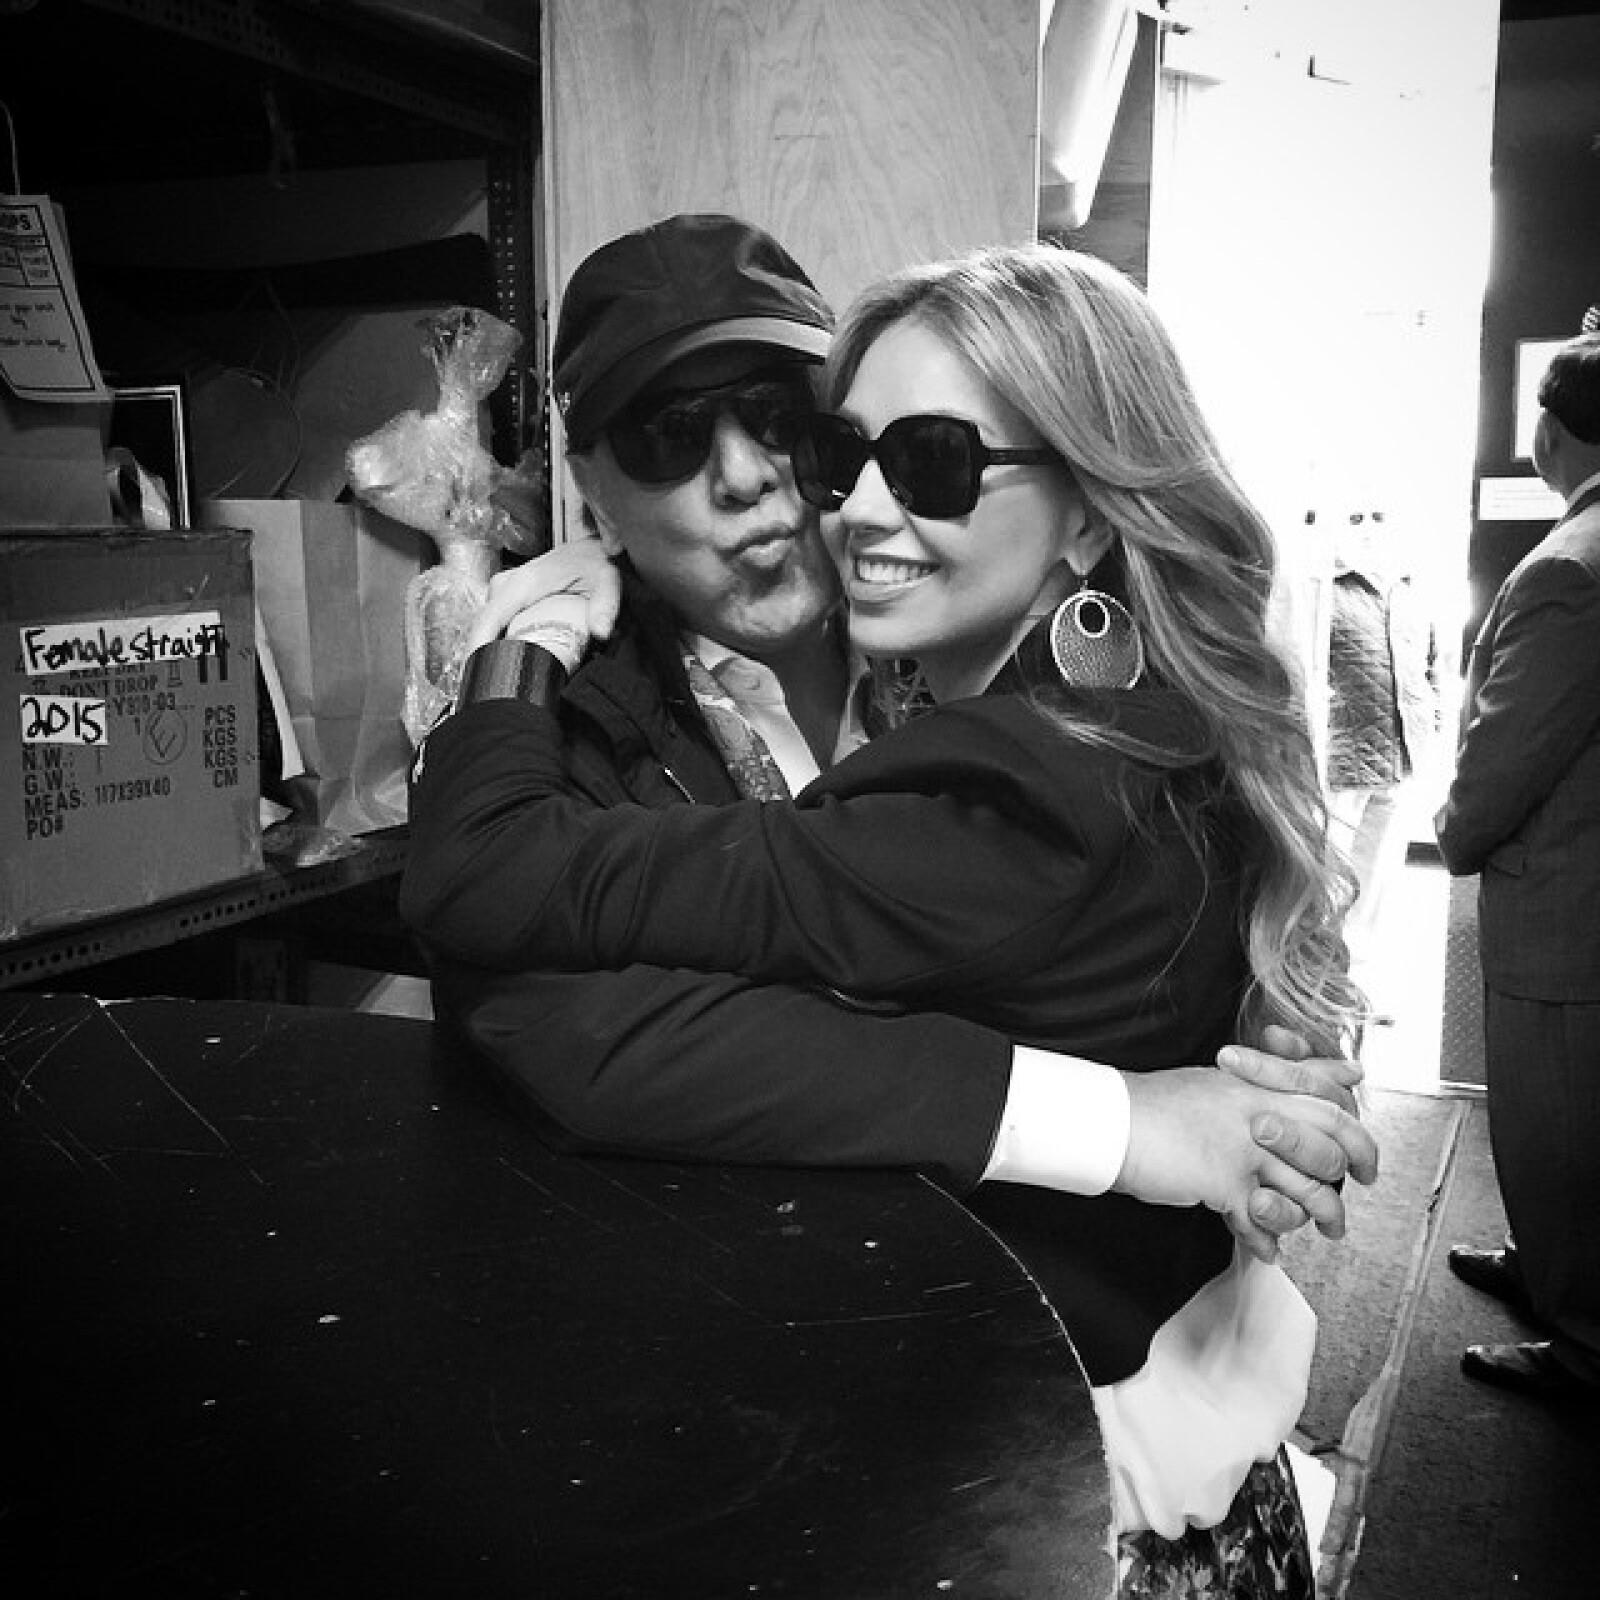 Thalía presume con estas fotos momentos románticos a su esposo.